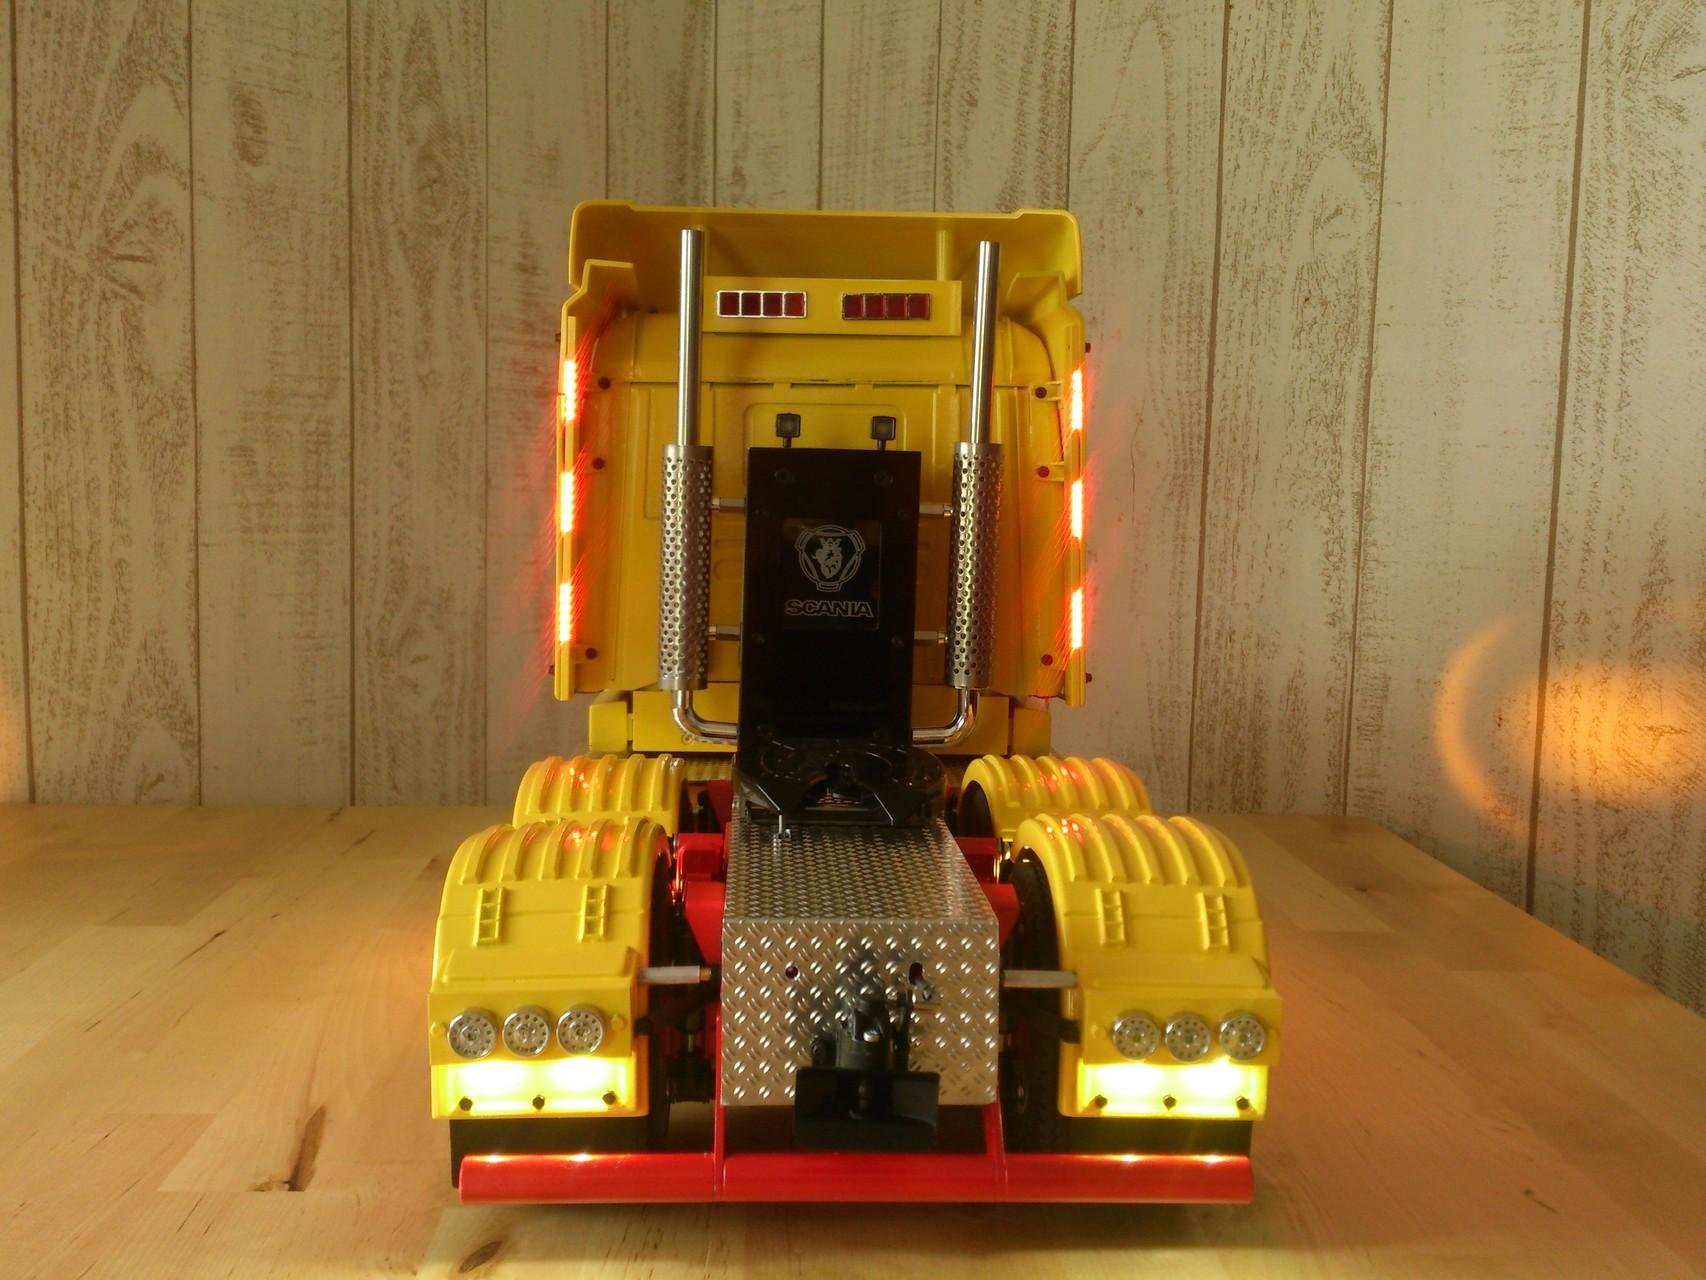 Scania CT19の背面